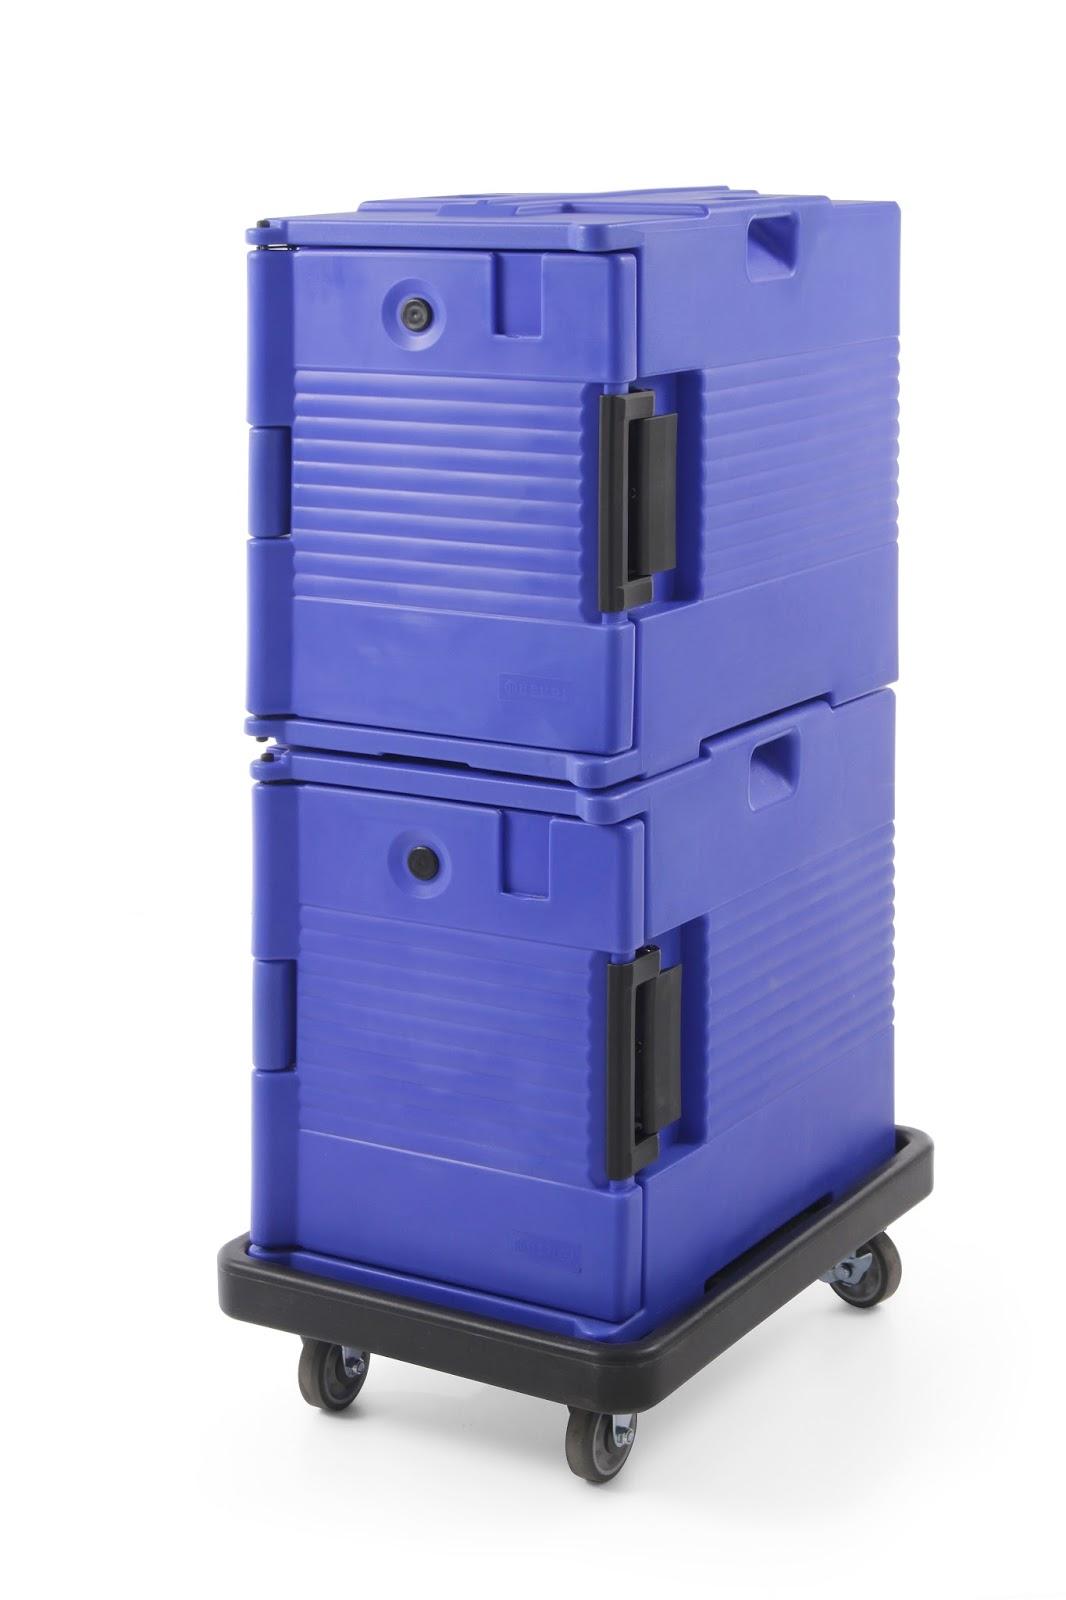 Cutii Termice Transport si Depozitare, Modele de Cutii Termice, Preturi, GN 1/1, Profesionale Horeca, Containere Termoizolante, Catering